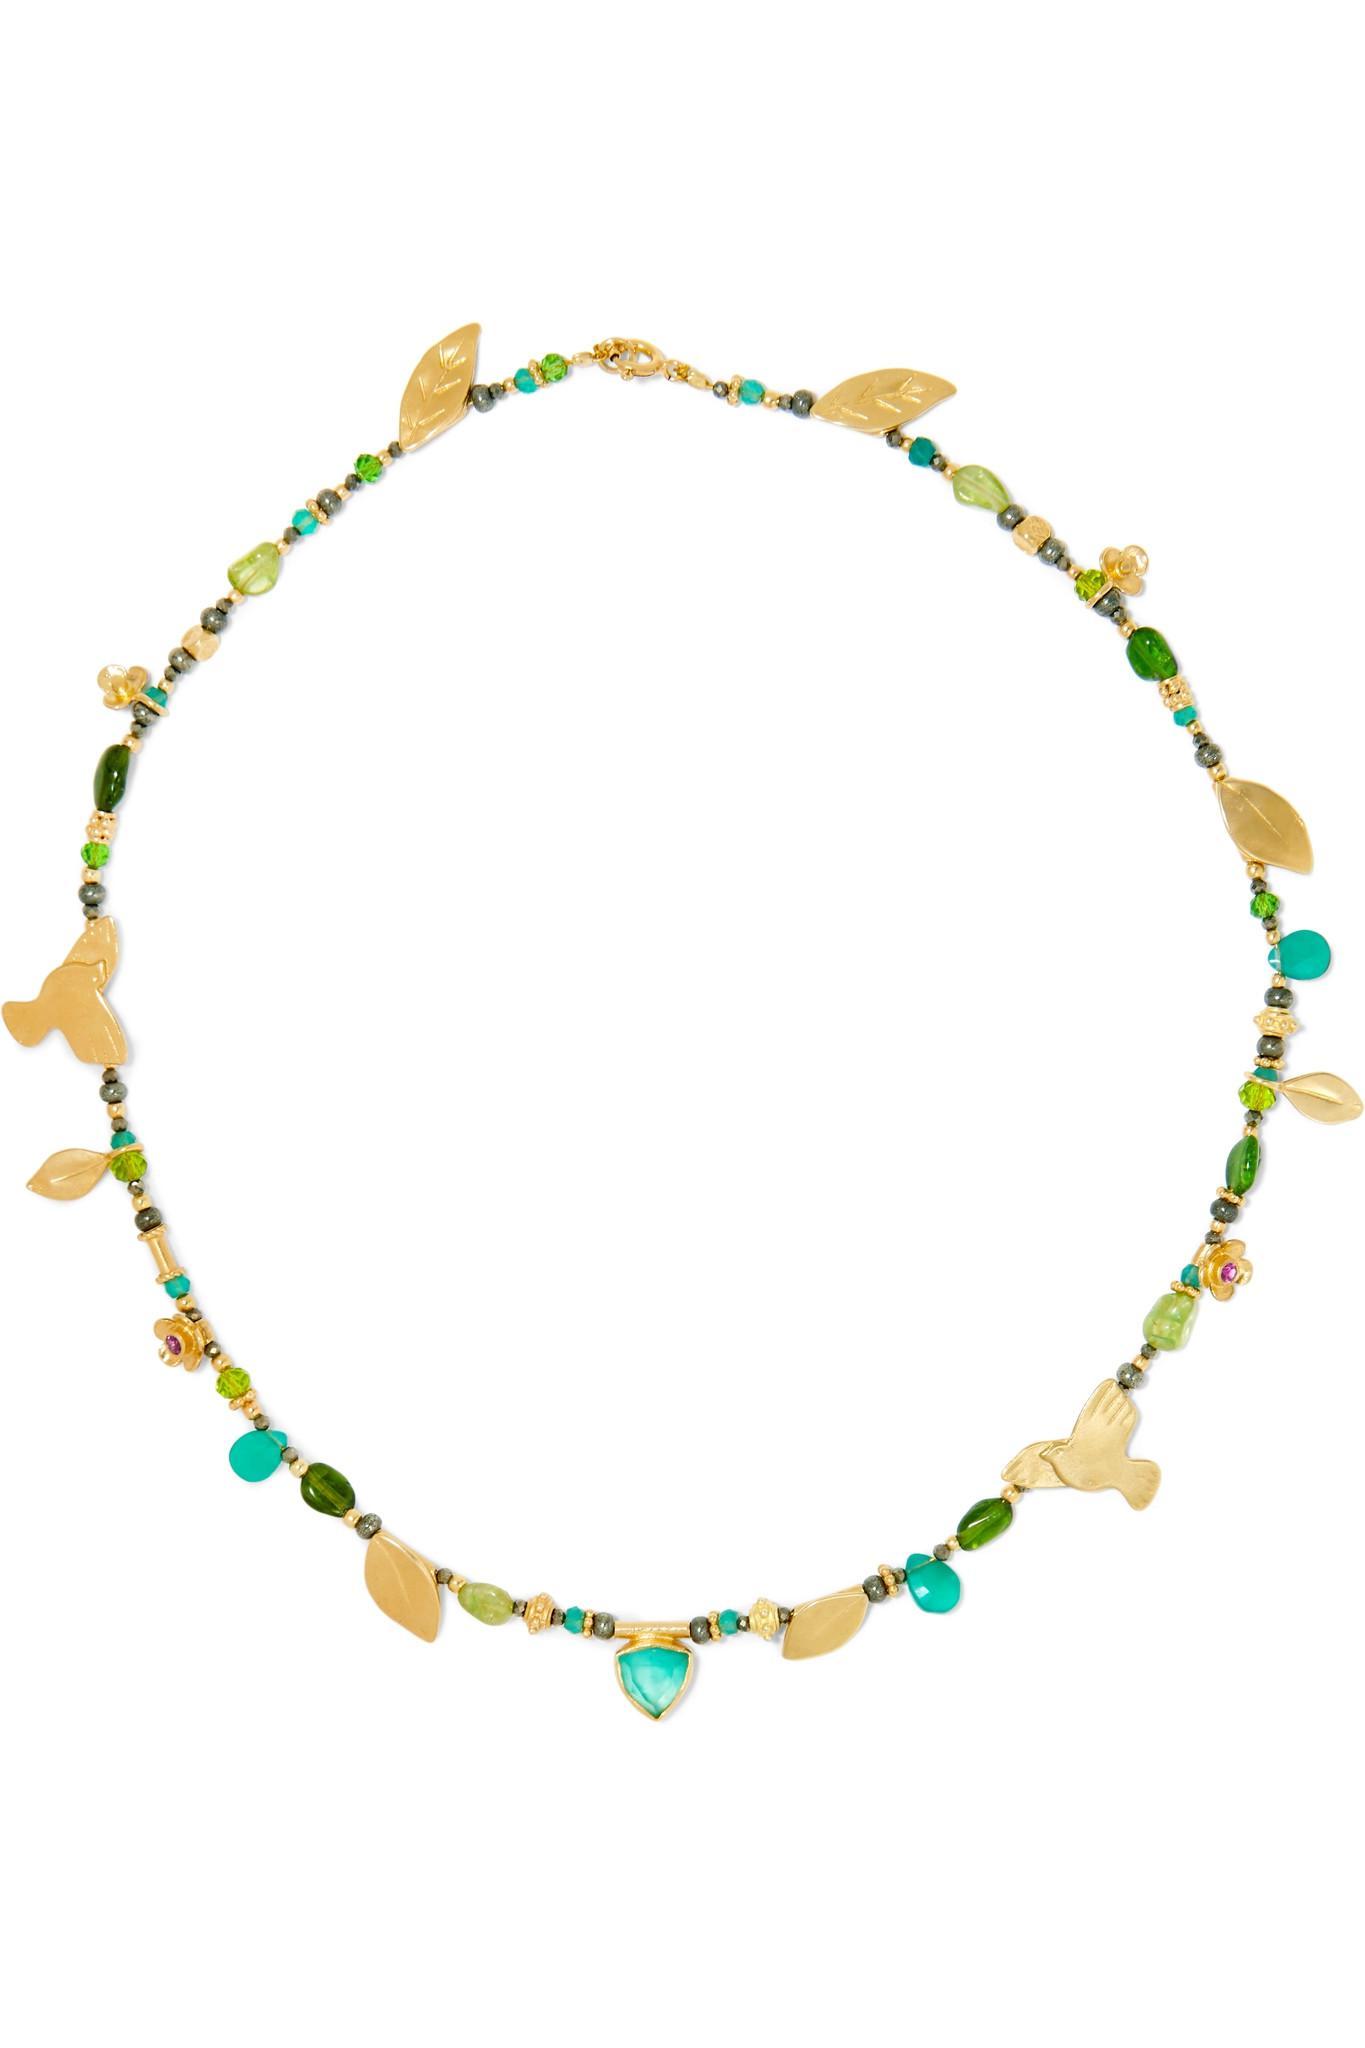 Collier De Perles Tassie - Makriyianni De Blanc Katerina JsgunYiz